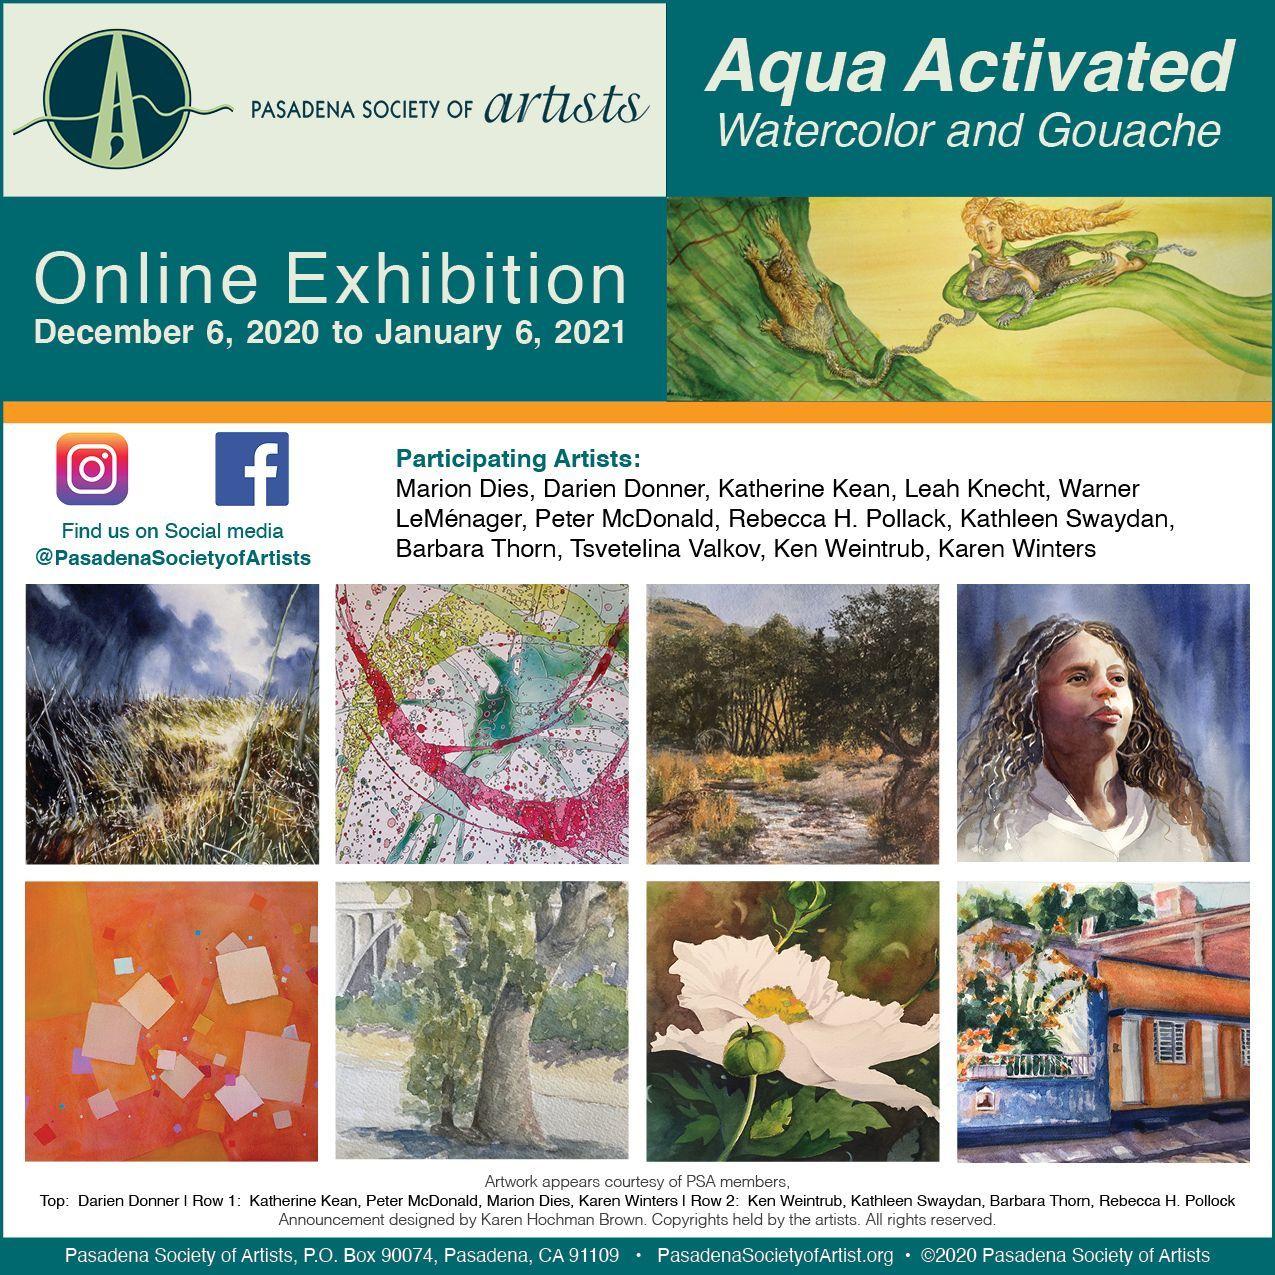 Aqua Activated